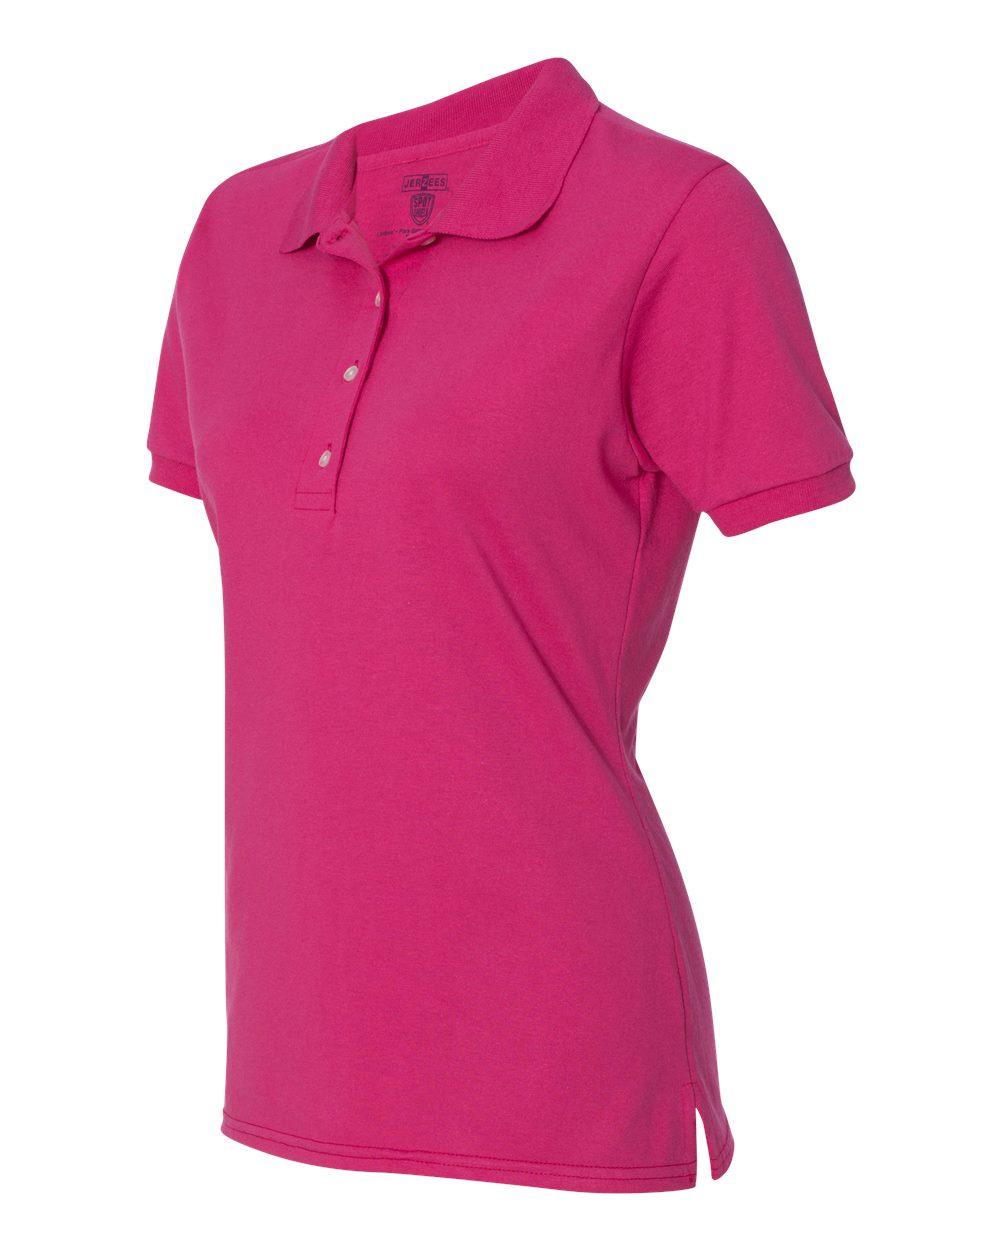 Jerzees-Womens-5-6-oz-50-50-Jersey-Polo-with-Spot-Shield-437W-Size-S-2XL thumbnail 17